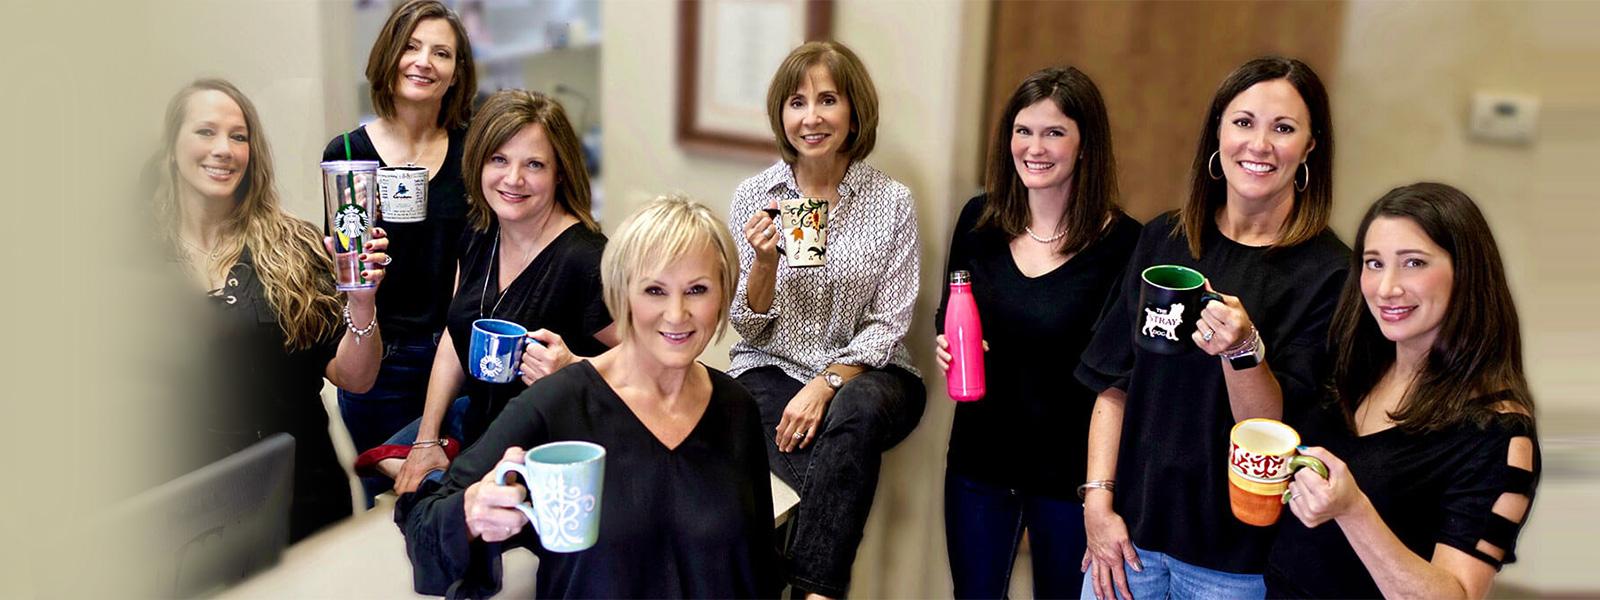 The best dental team in Carol Stream, IL